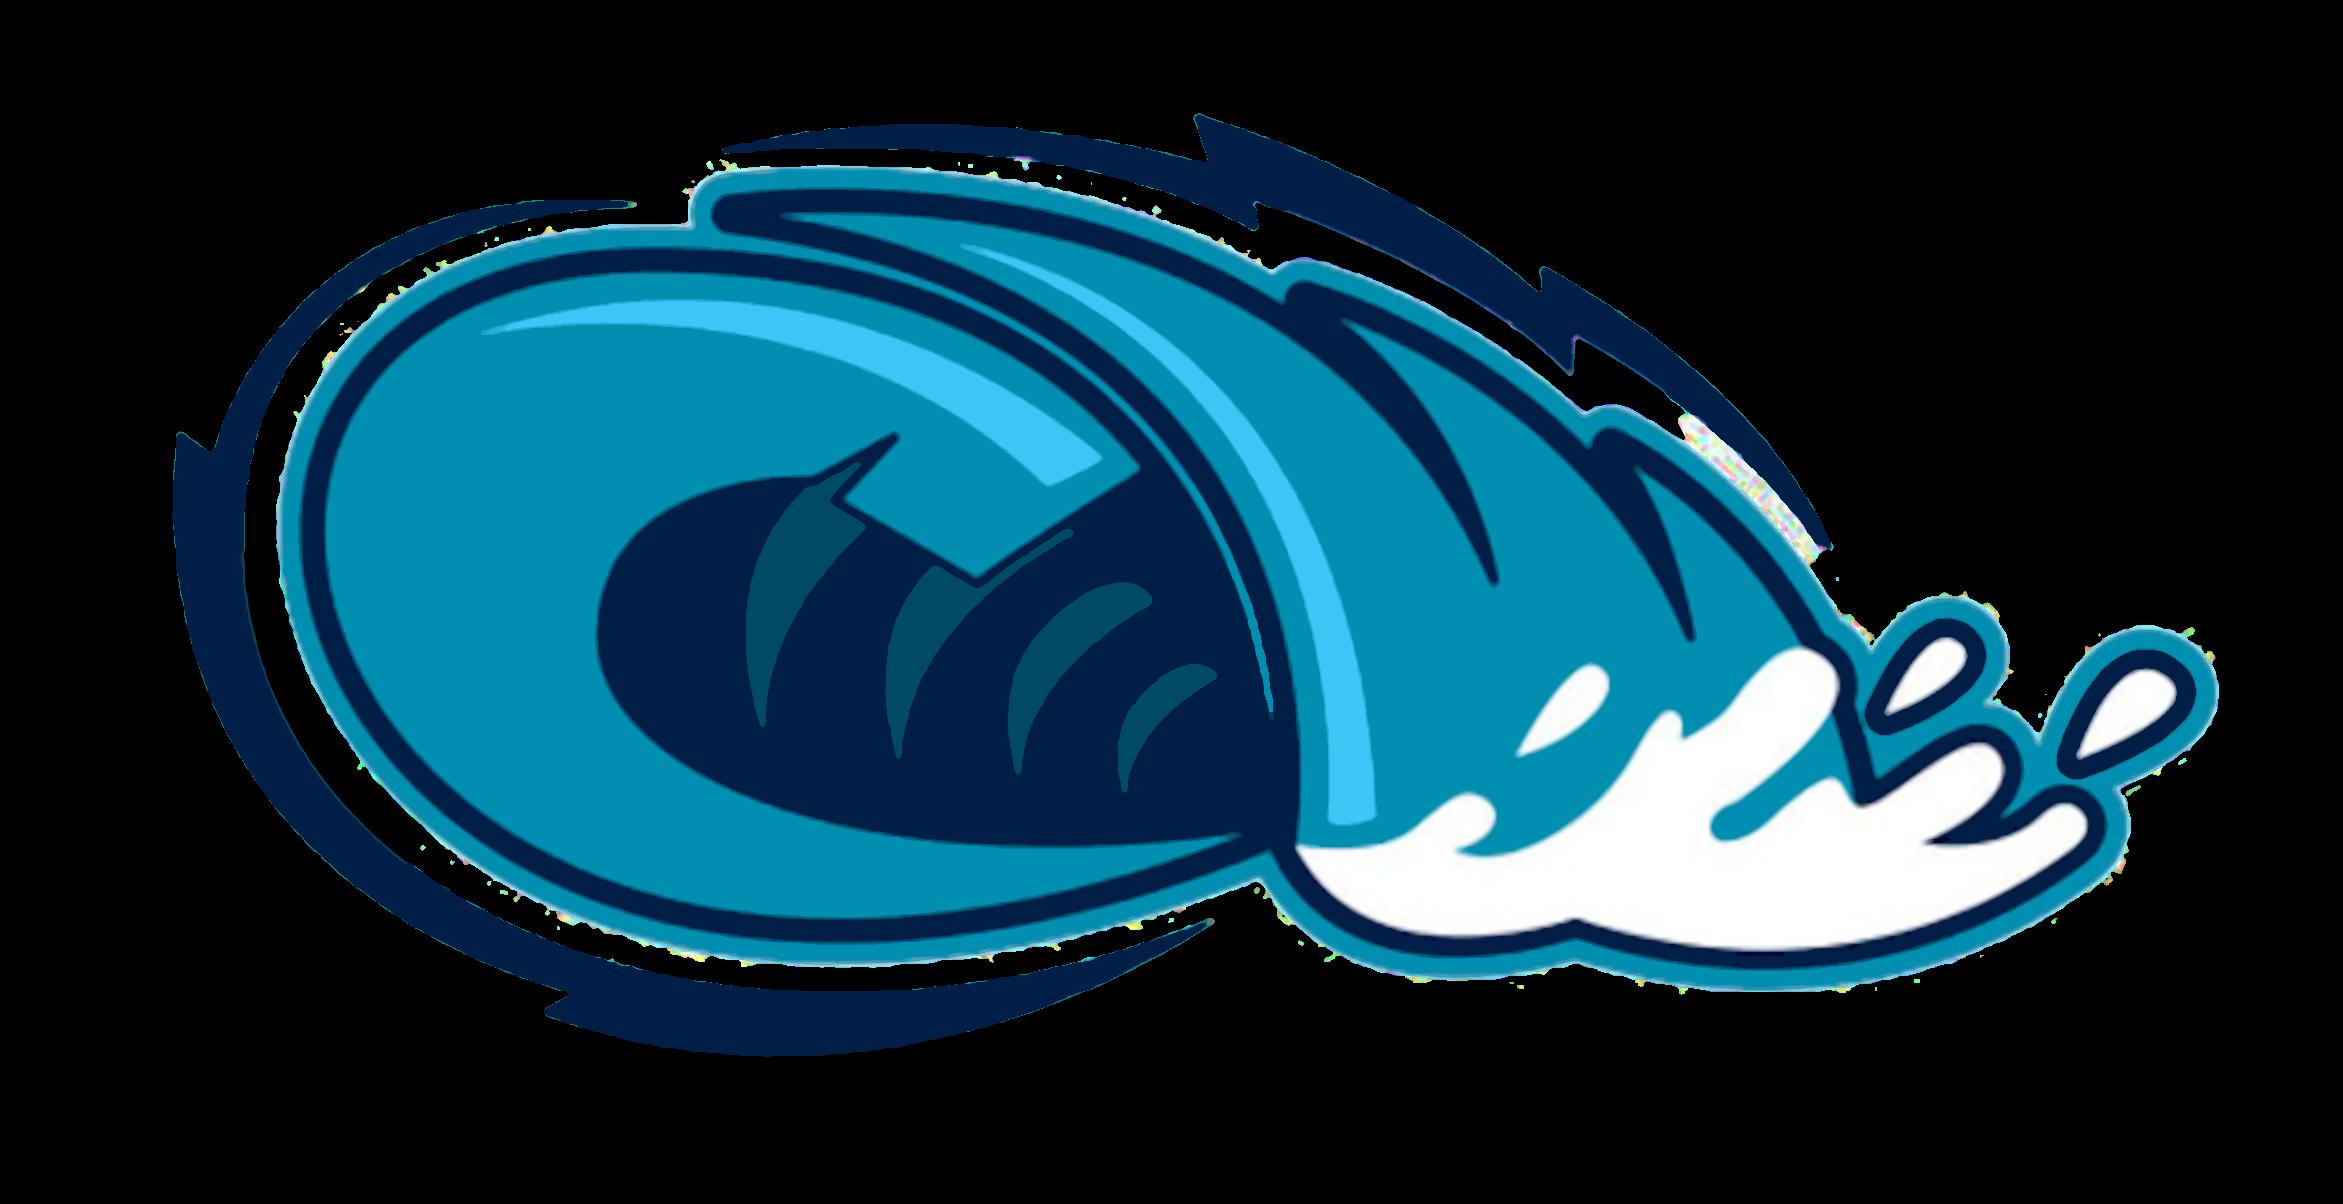 Clipart wave wave energy, Clipart wave wave energy.